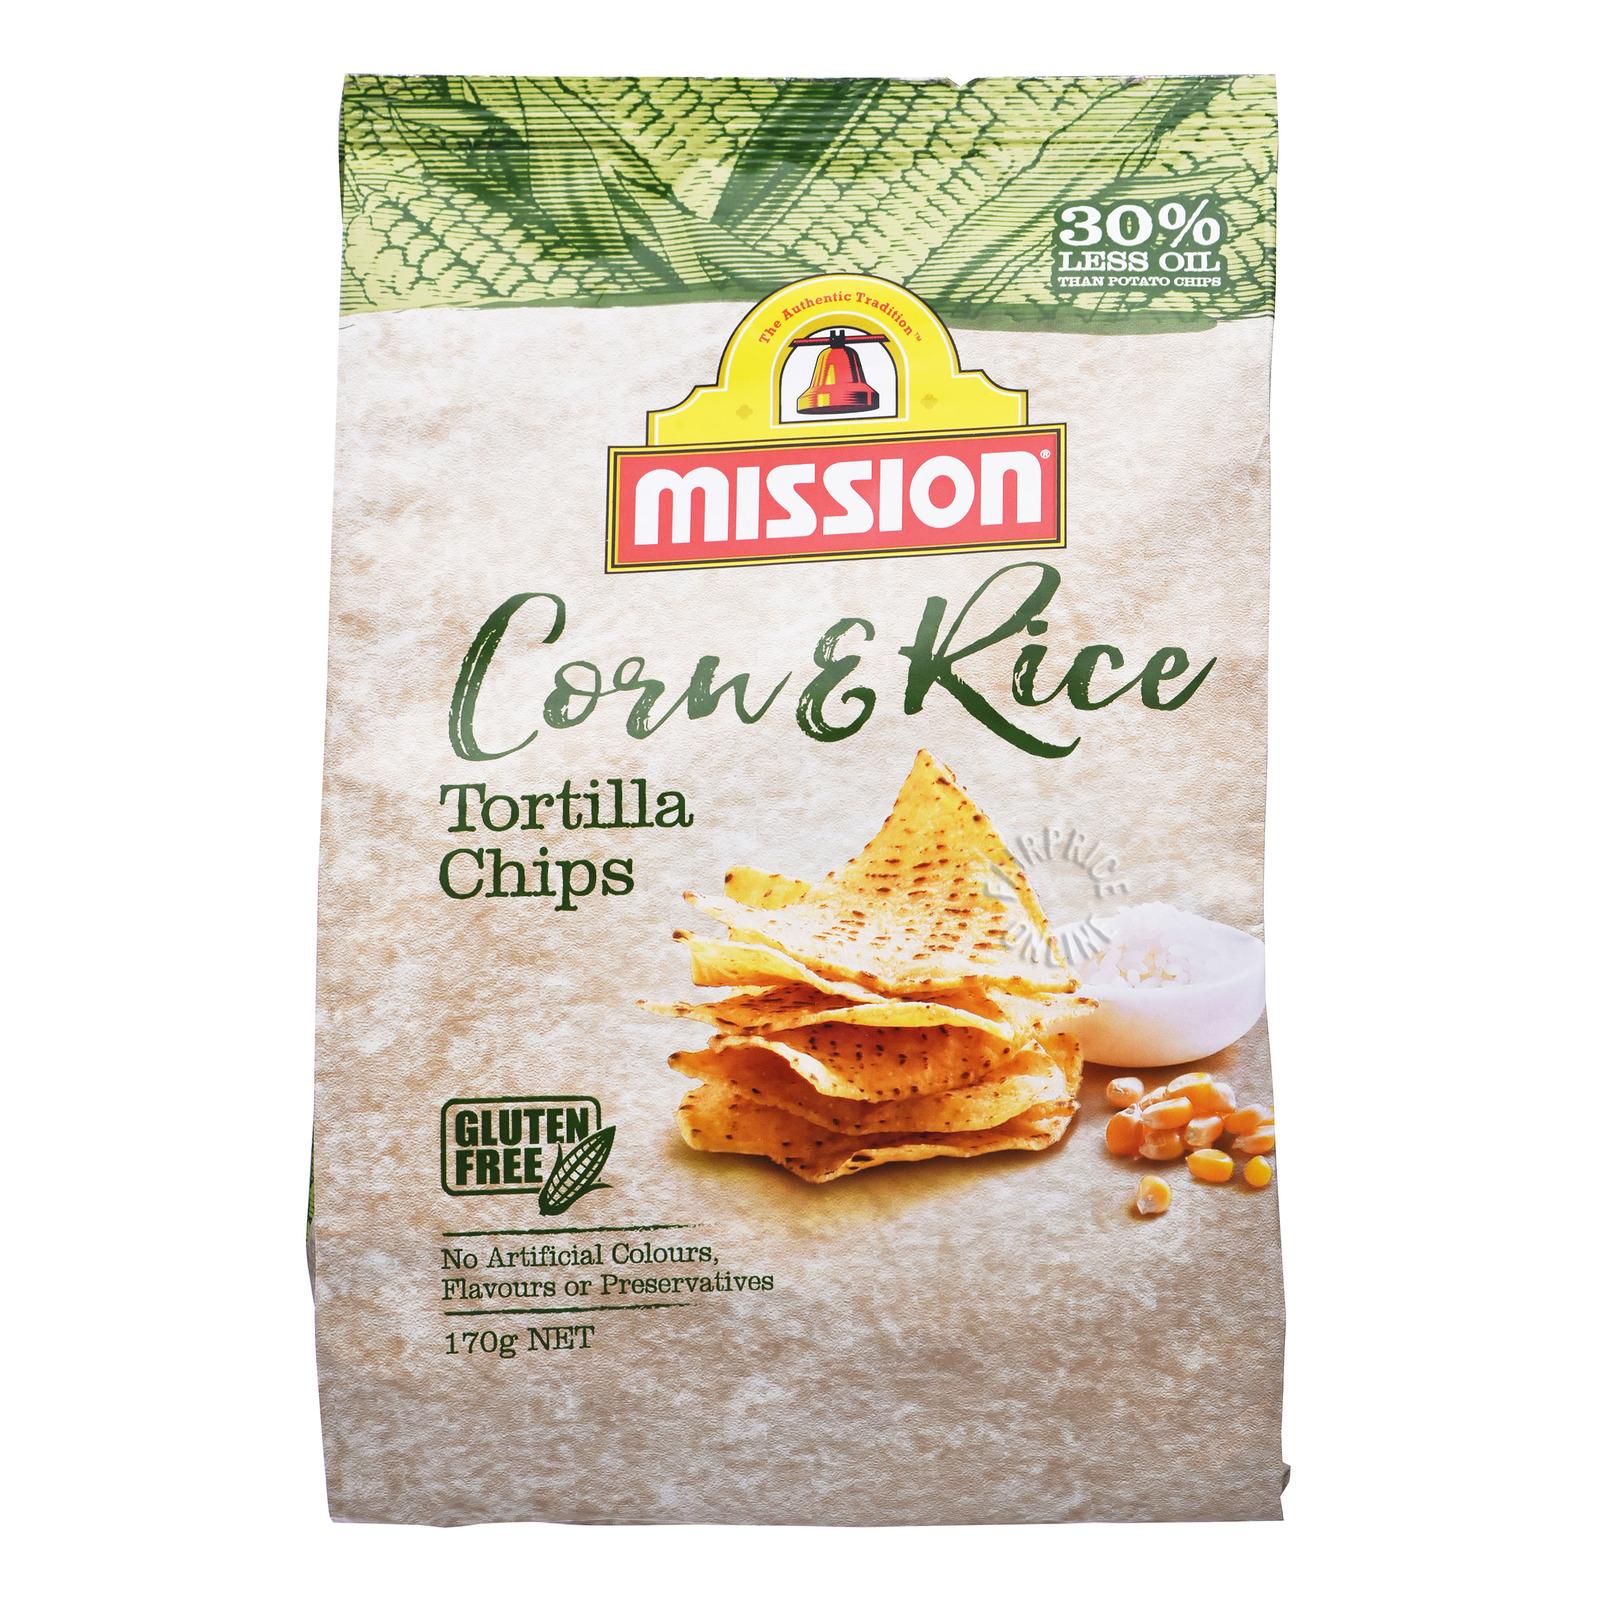 Mission Tortilla Chips - Corn & Rice